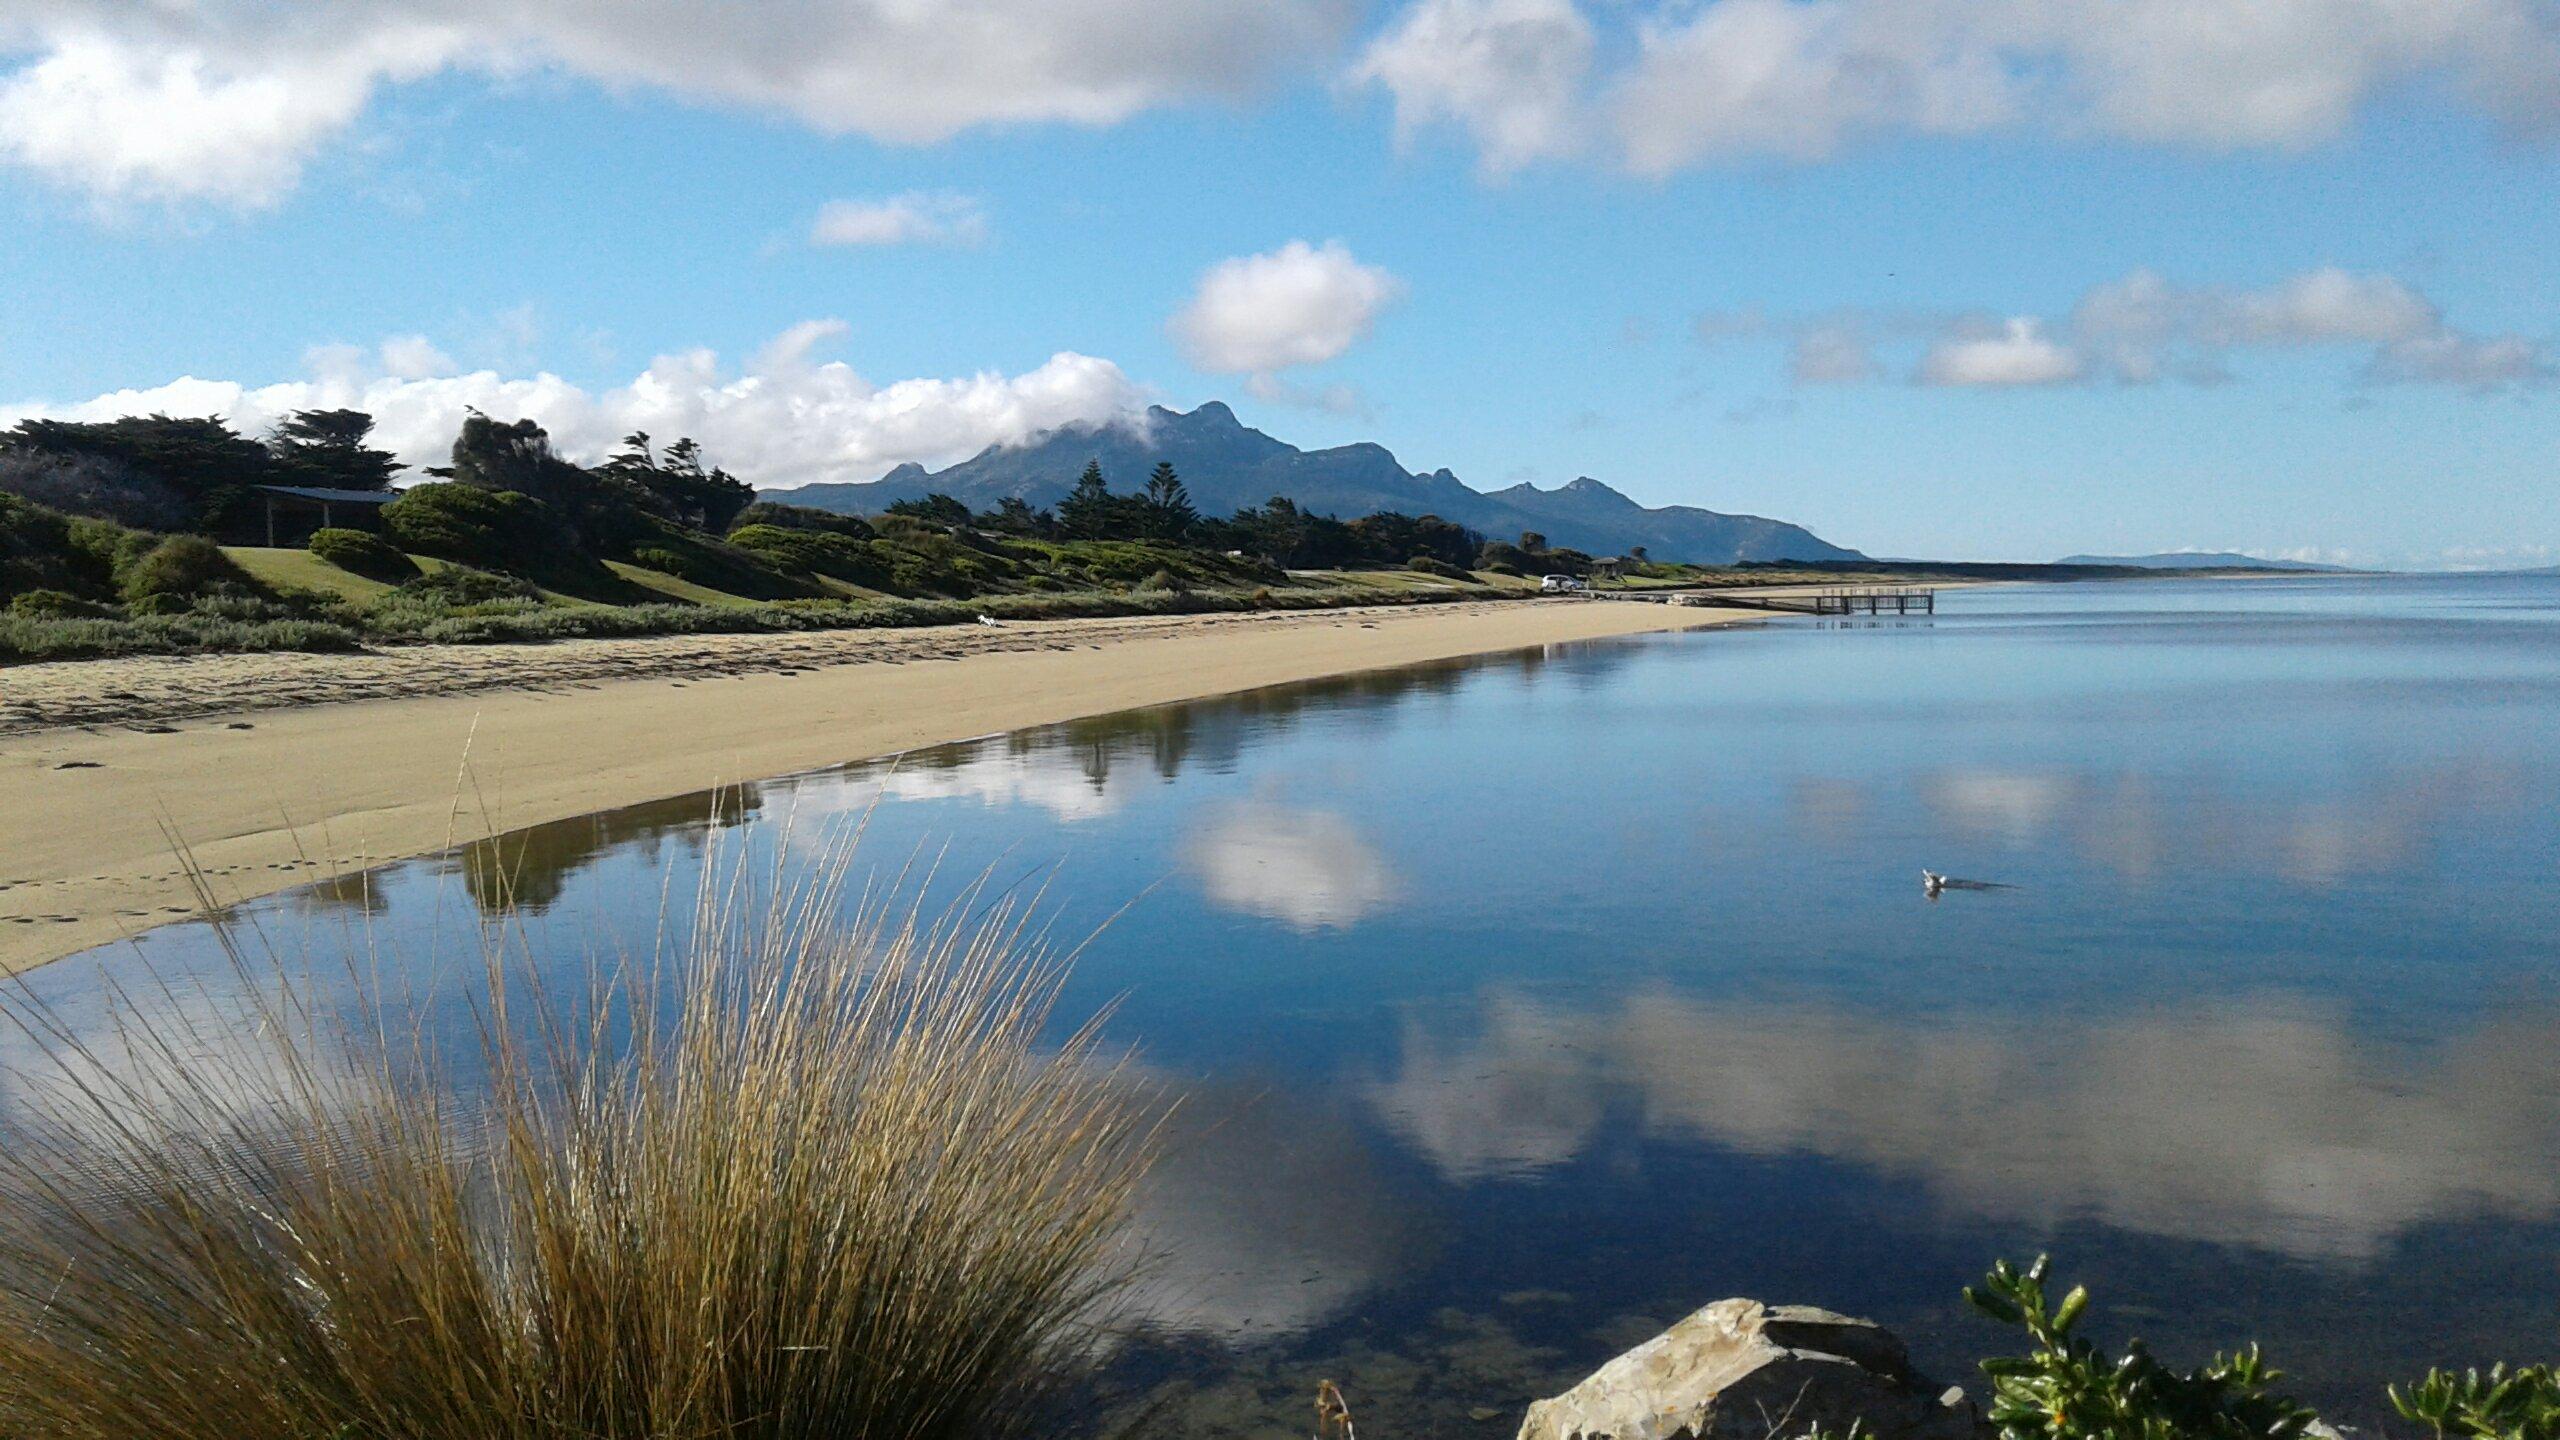 mt strzelecki whitemark flinders island tasmania